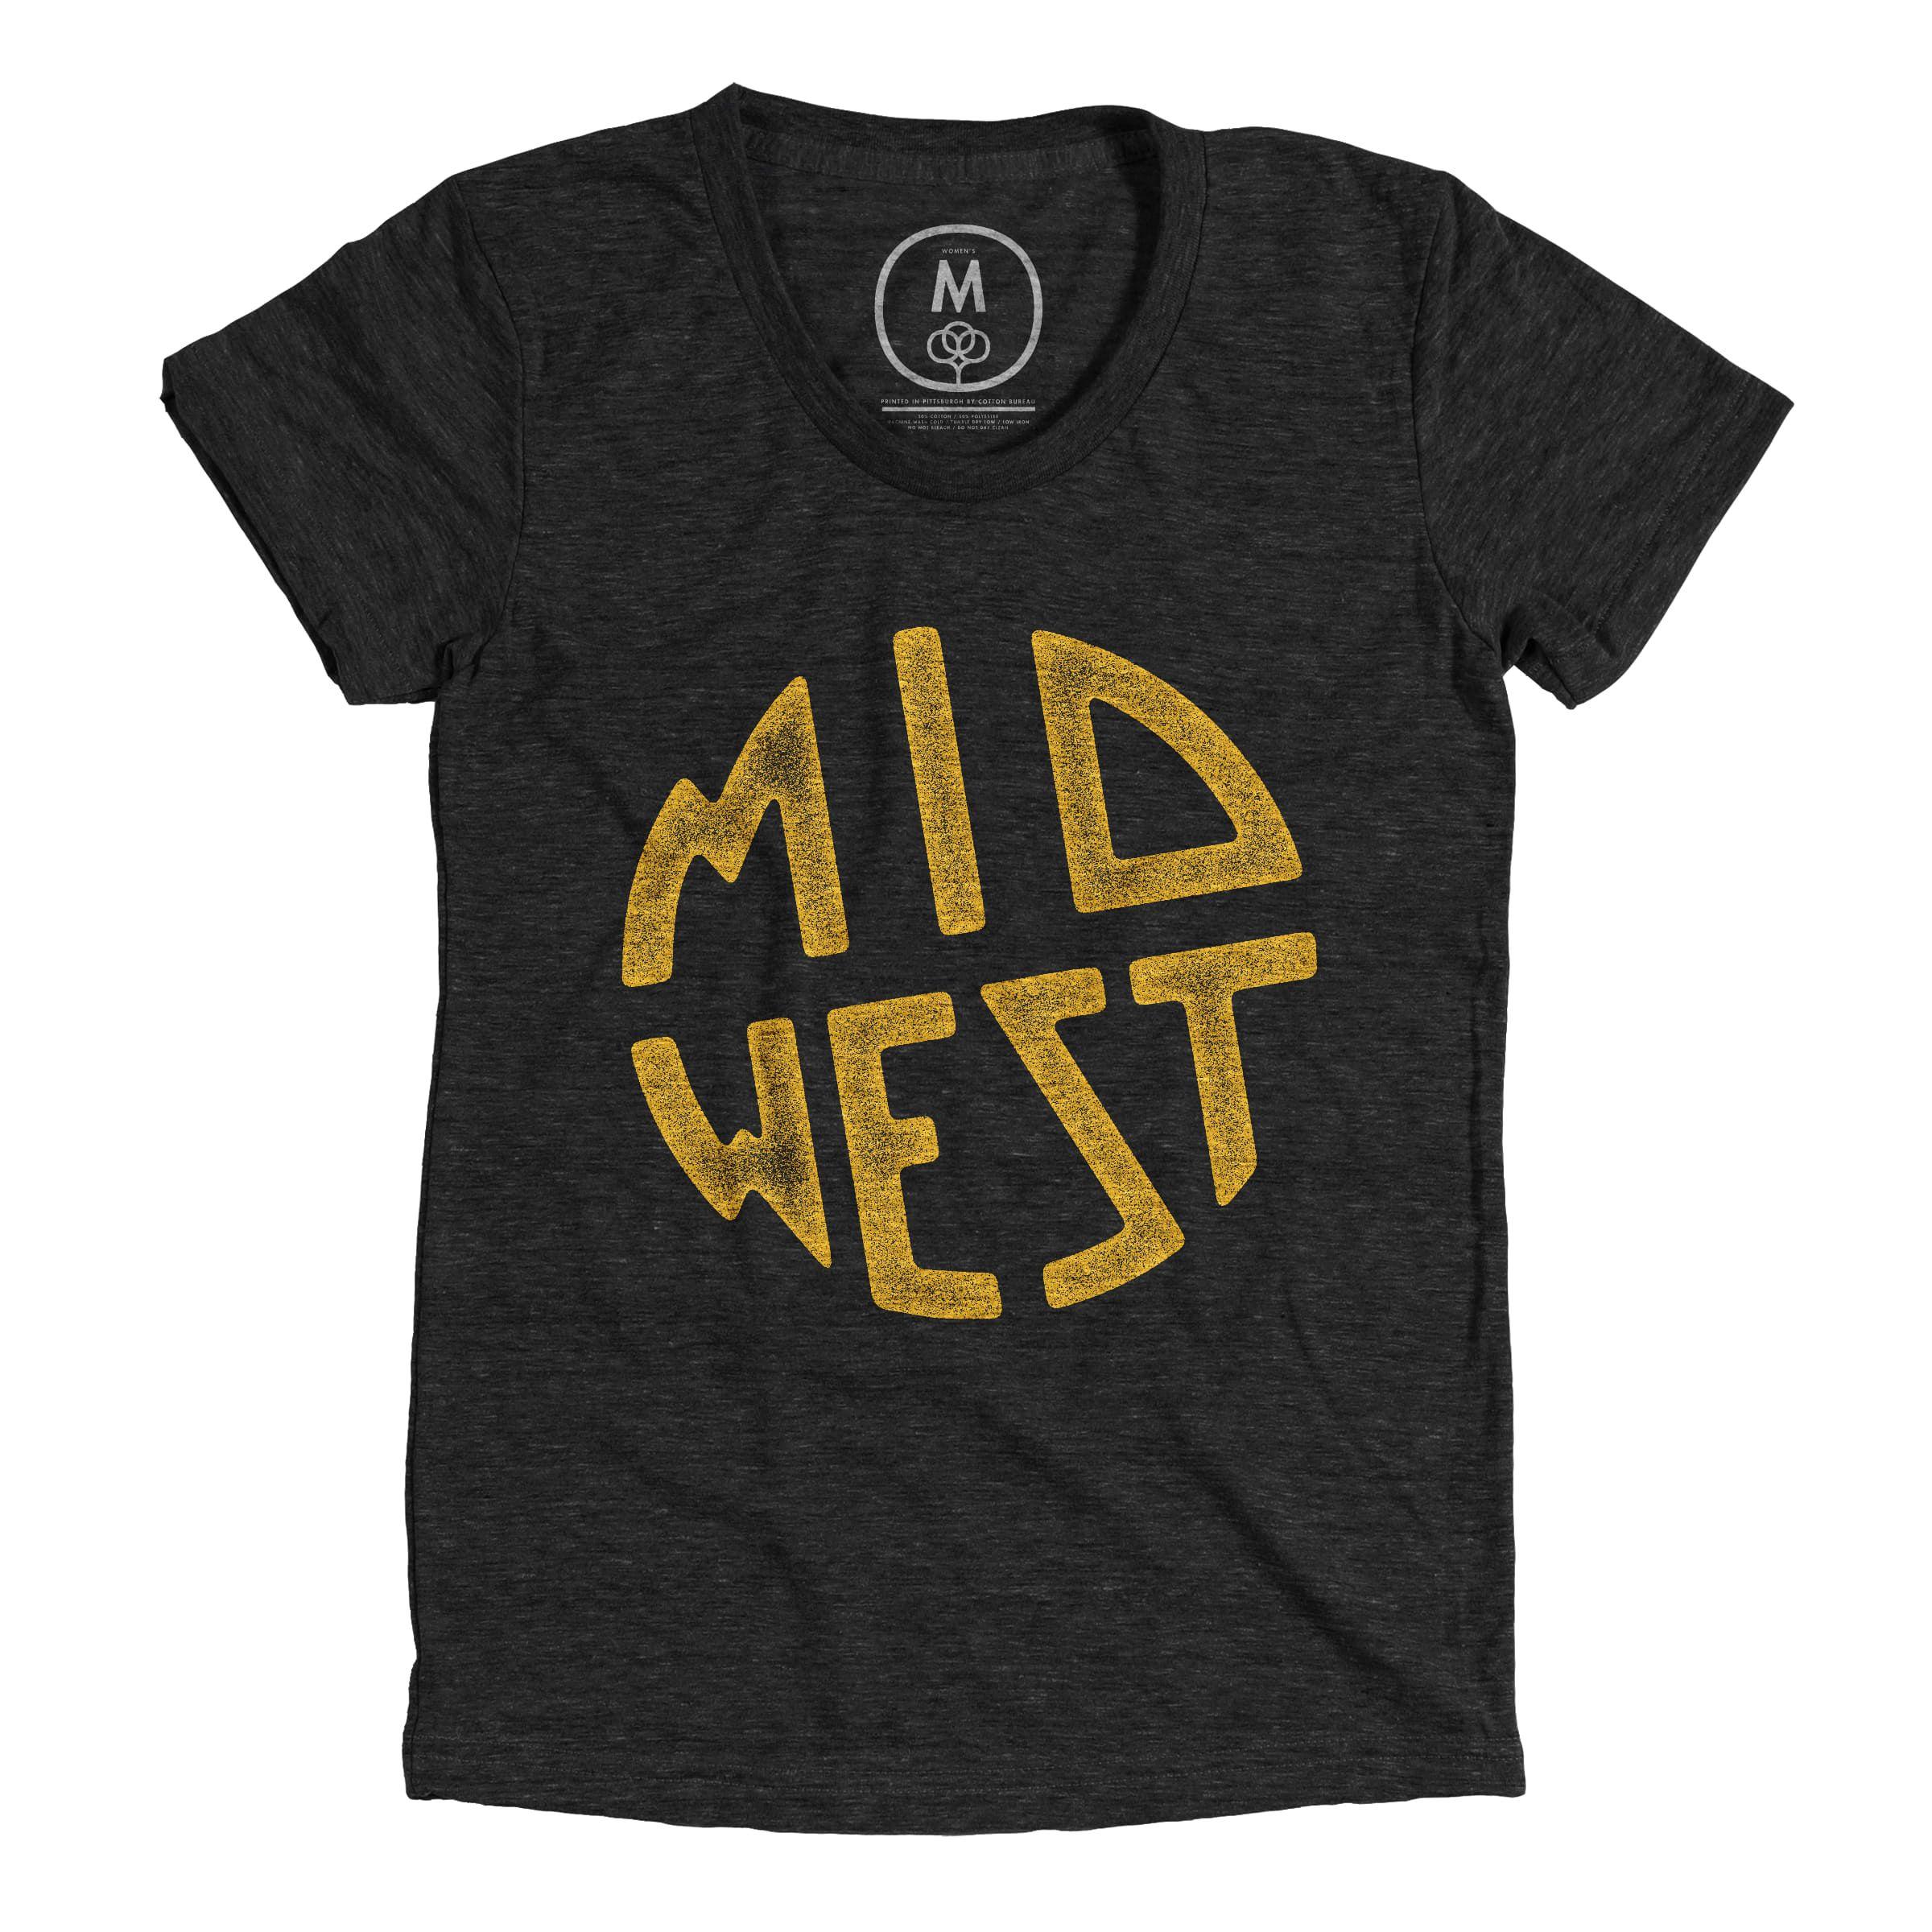 Midwest Vintage Black Womens Wood Shop Pinterest Shirt